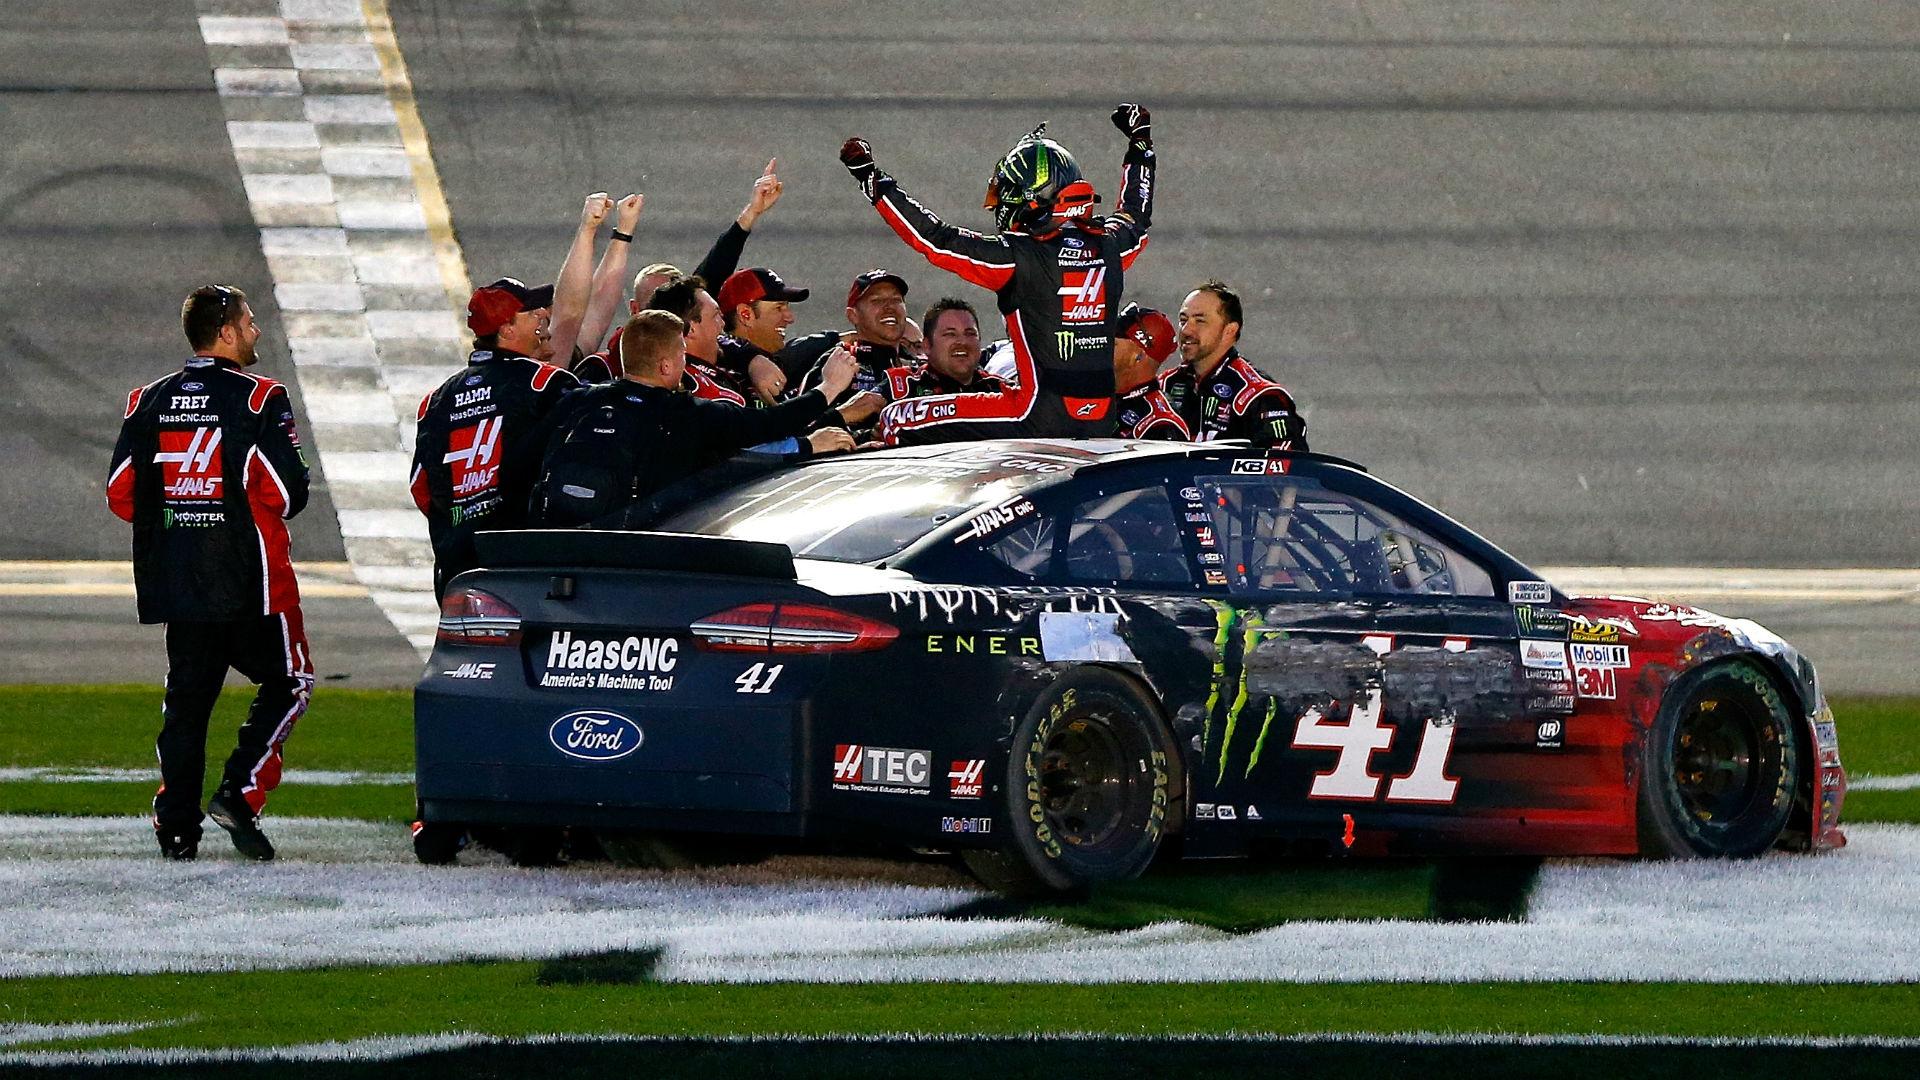 NASCAR starting lineup at Texas: Kurt Busch wins pole in rain-shortened qualifying